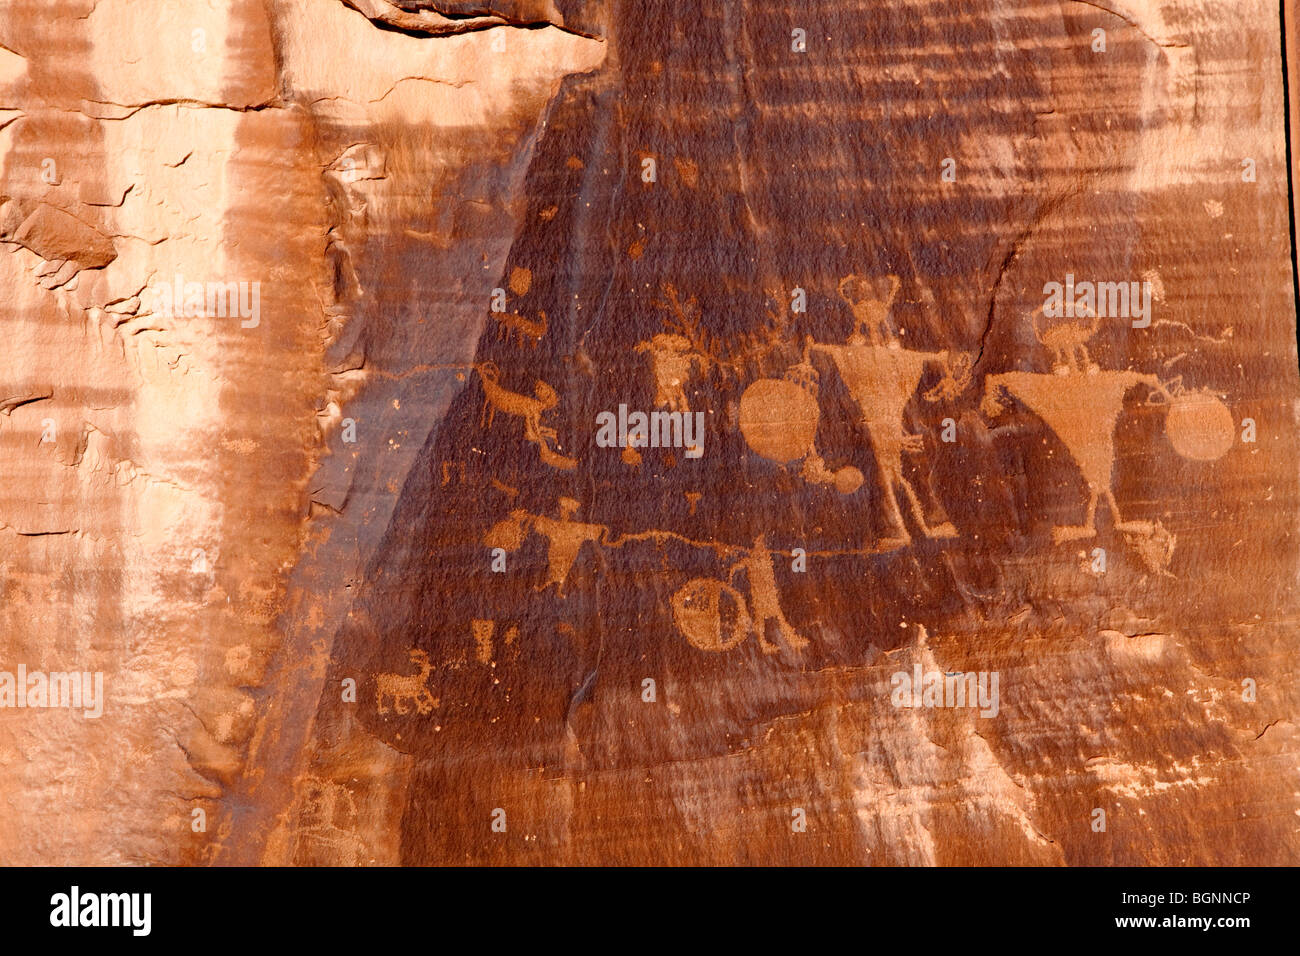 Anasazi Petroglyphs, Canyonlands National Park, USA - Stock Image